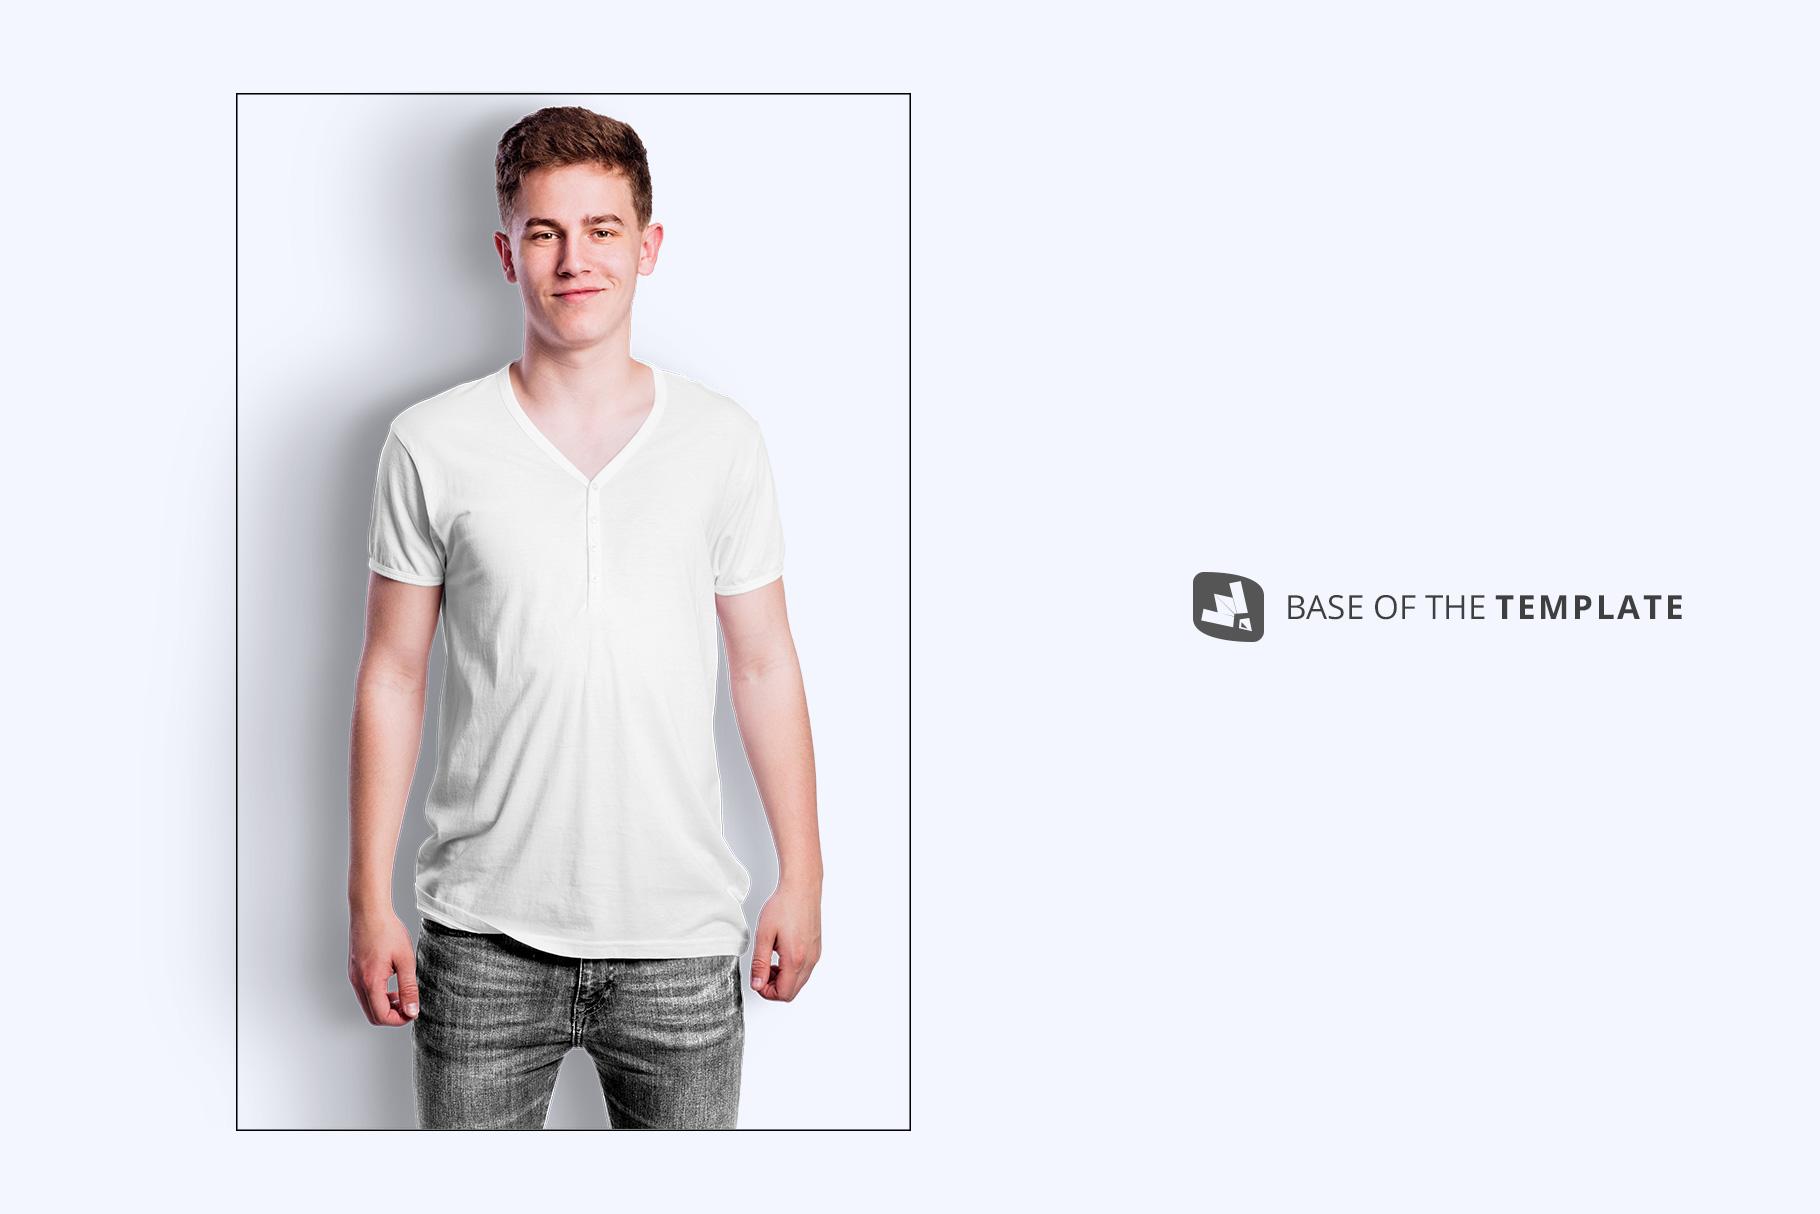 base image of the mens vneck tshirt mockup